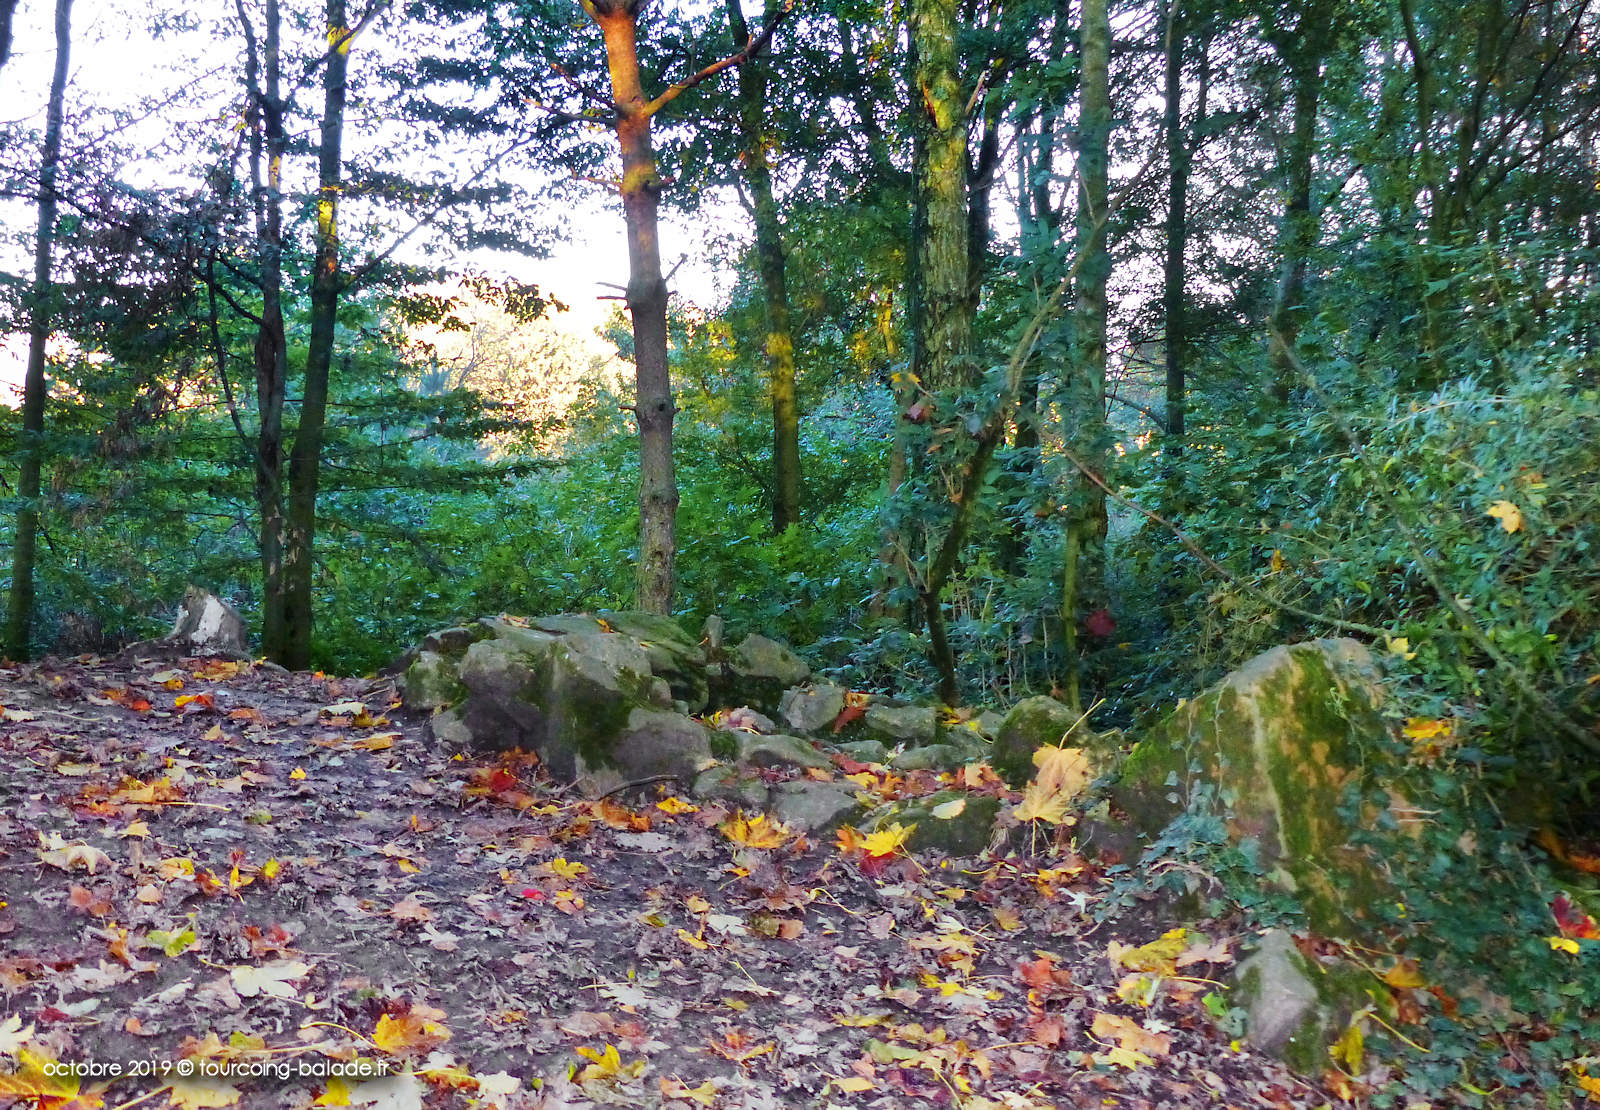 Parc de l'Yser, Neuville-en-Ferrain - Fauchage tardif